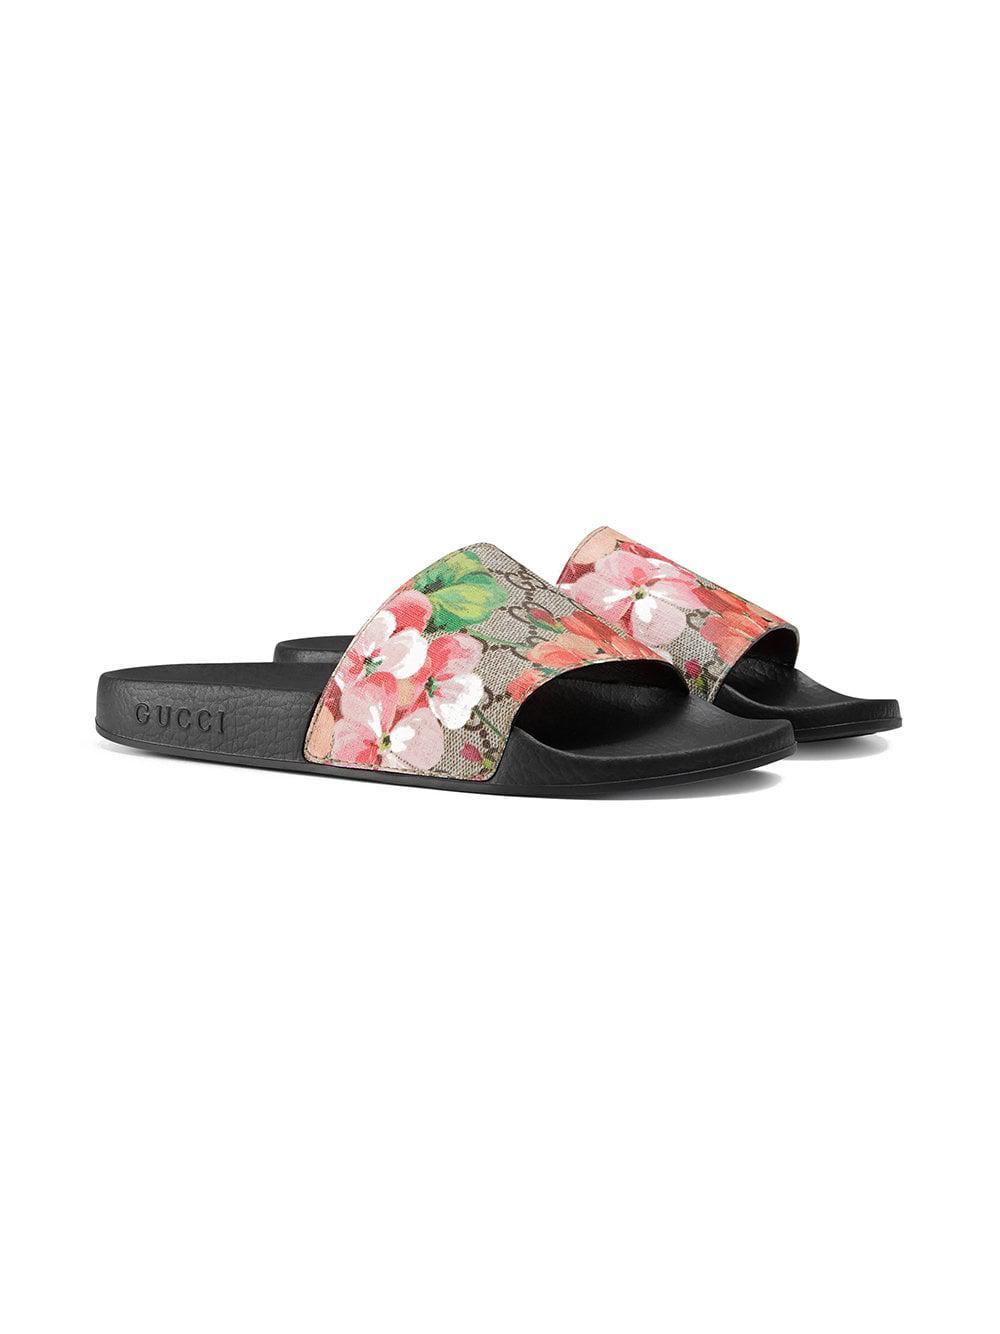 6f12d850178 Gucci GG Blooms Supreme Slide Sandals in Black - Lyst